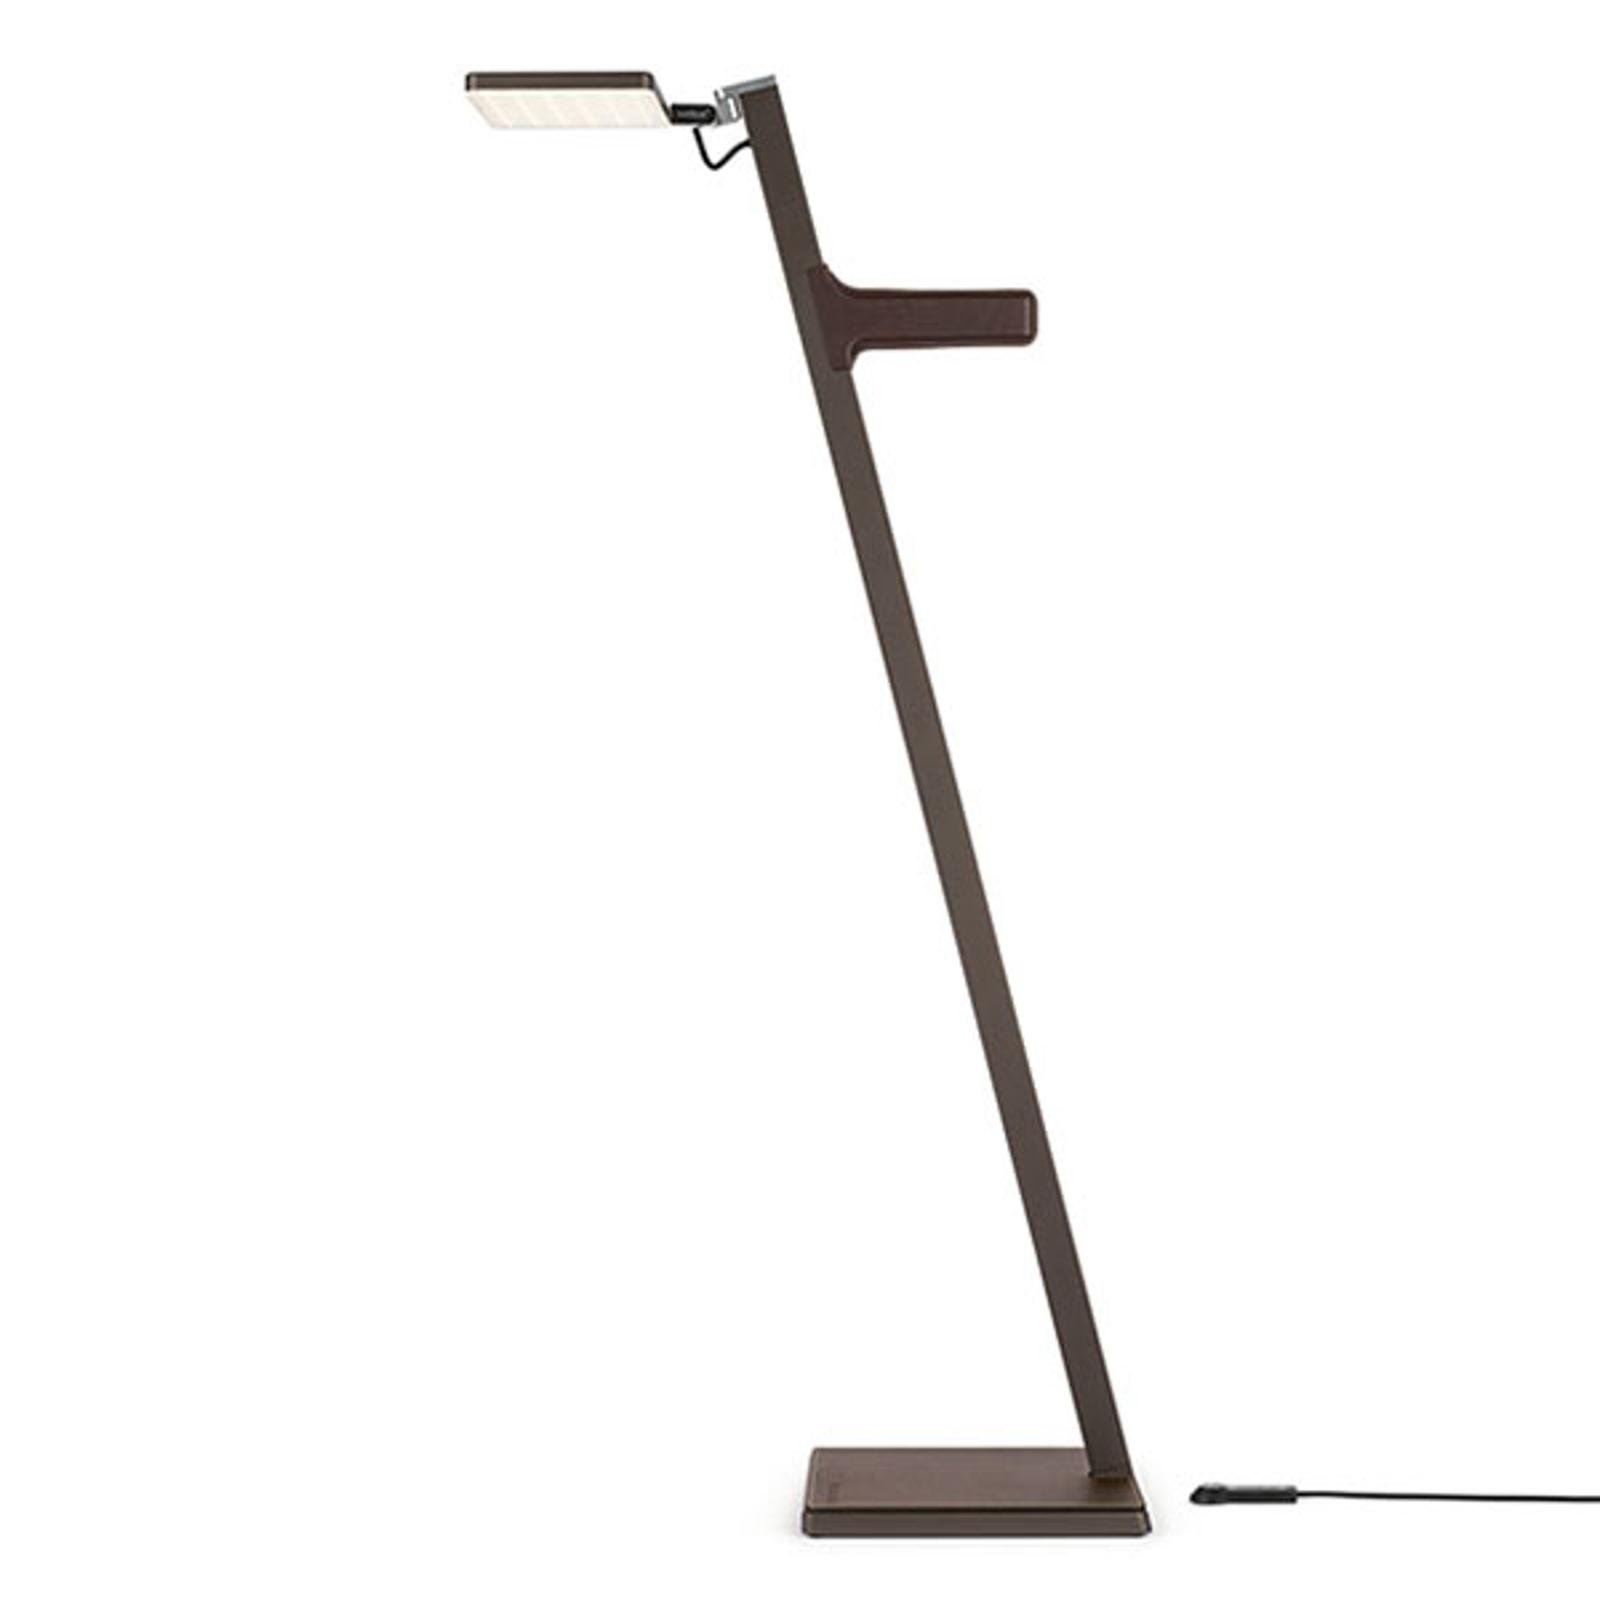 Nimbus Roxxane Leggera Walter Knoll vloerlamp